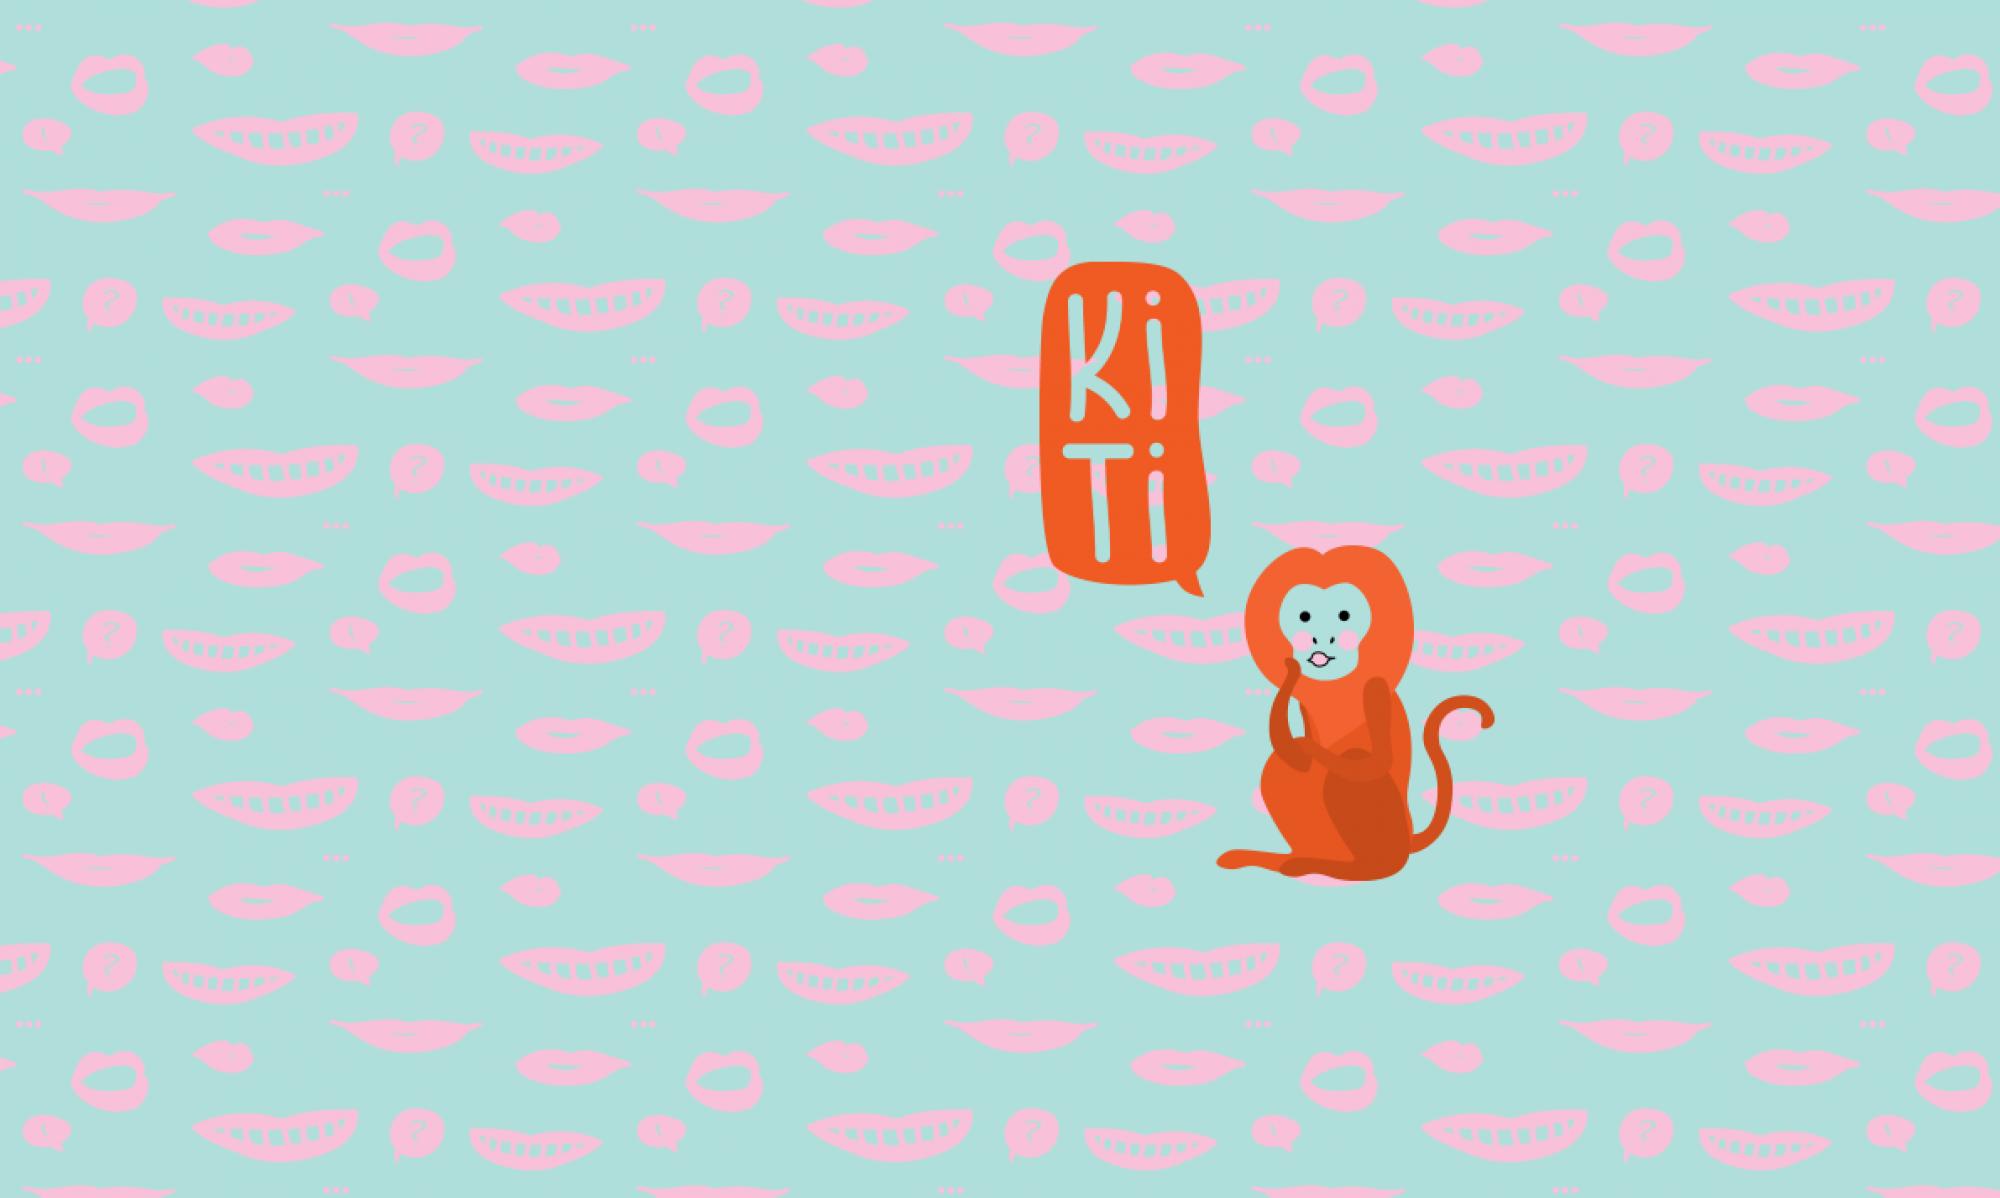 Kielitietoisuus // Language awareness // Språklig medvetenhet